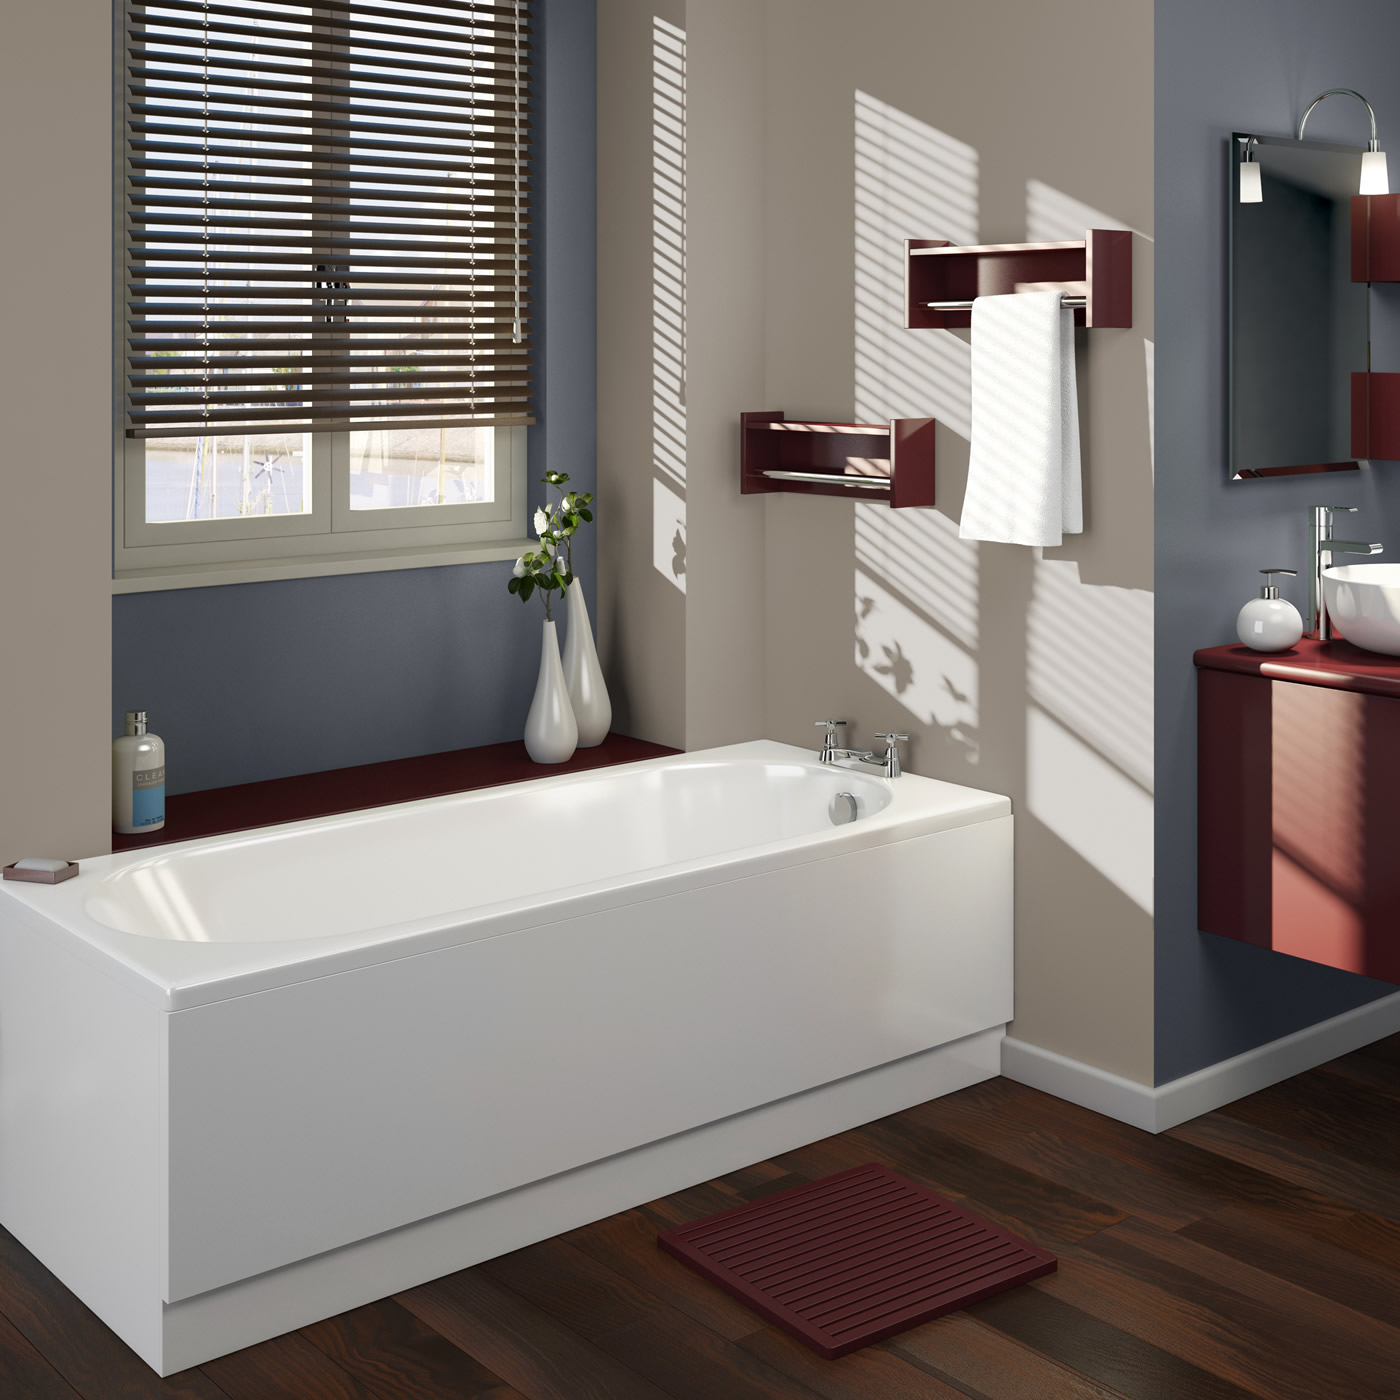 Vasca da bagno rettangolare 1500x700mm senza pannello vasca - Vasca da bagno rettangolare ...